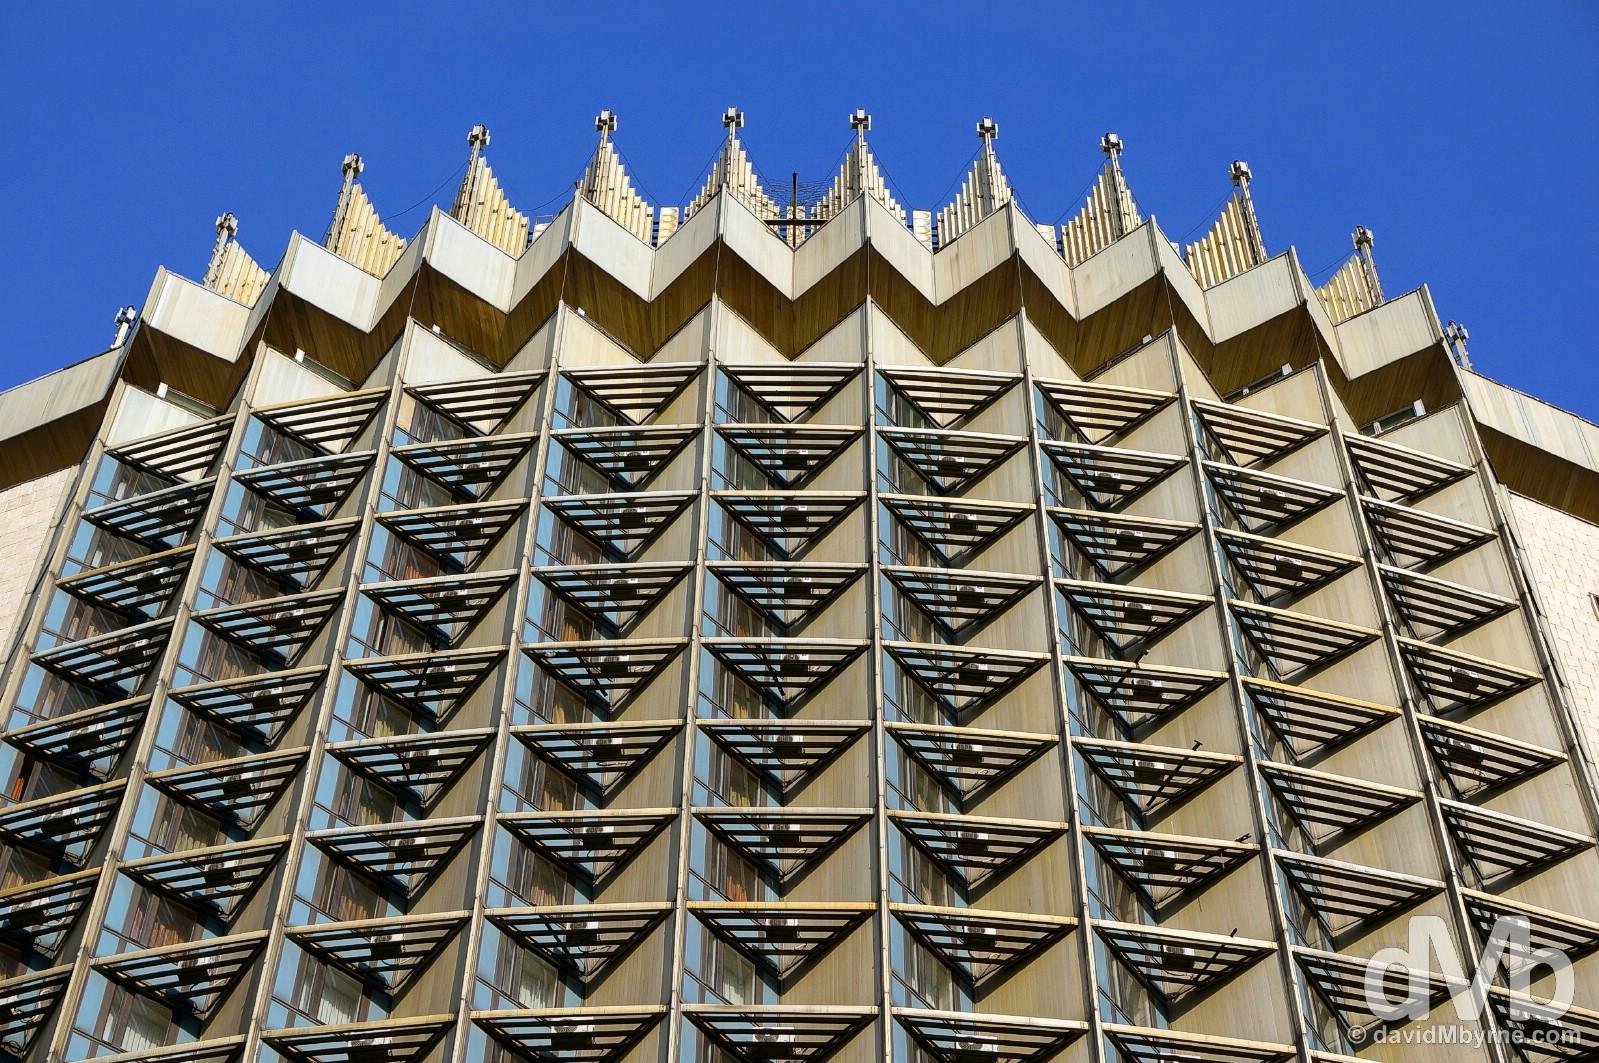 The upper floors of Hotel Kazakhstan in Almaty, Kazakhstan. February 21, 2015.